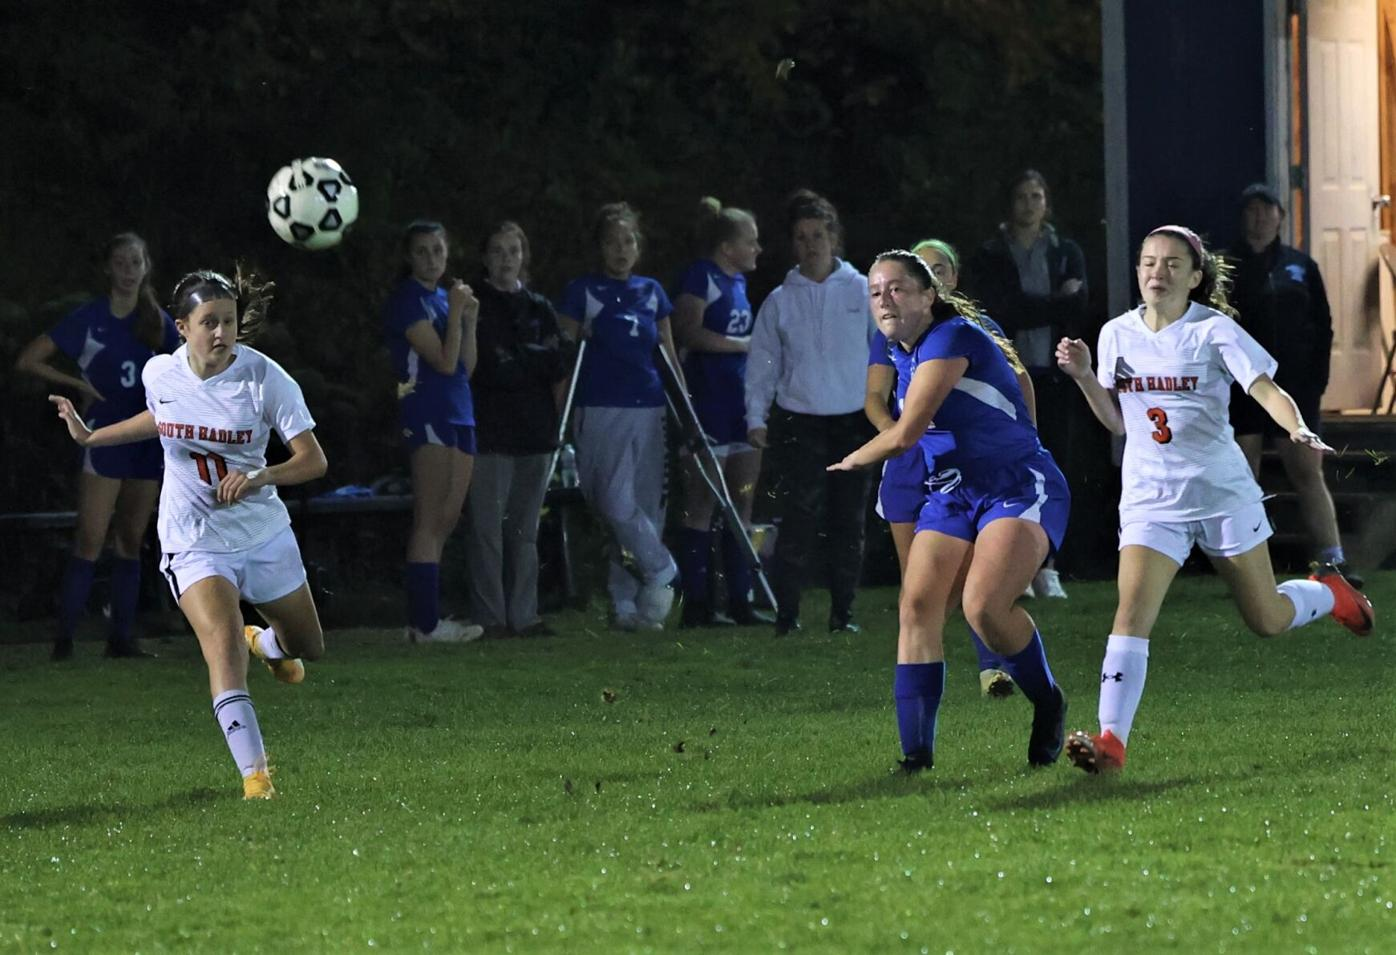 claire naef kicks a ball